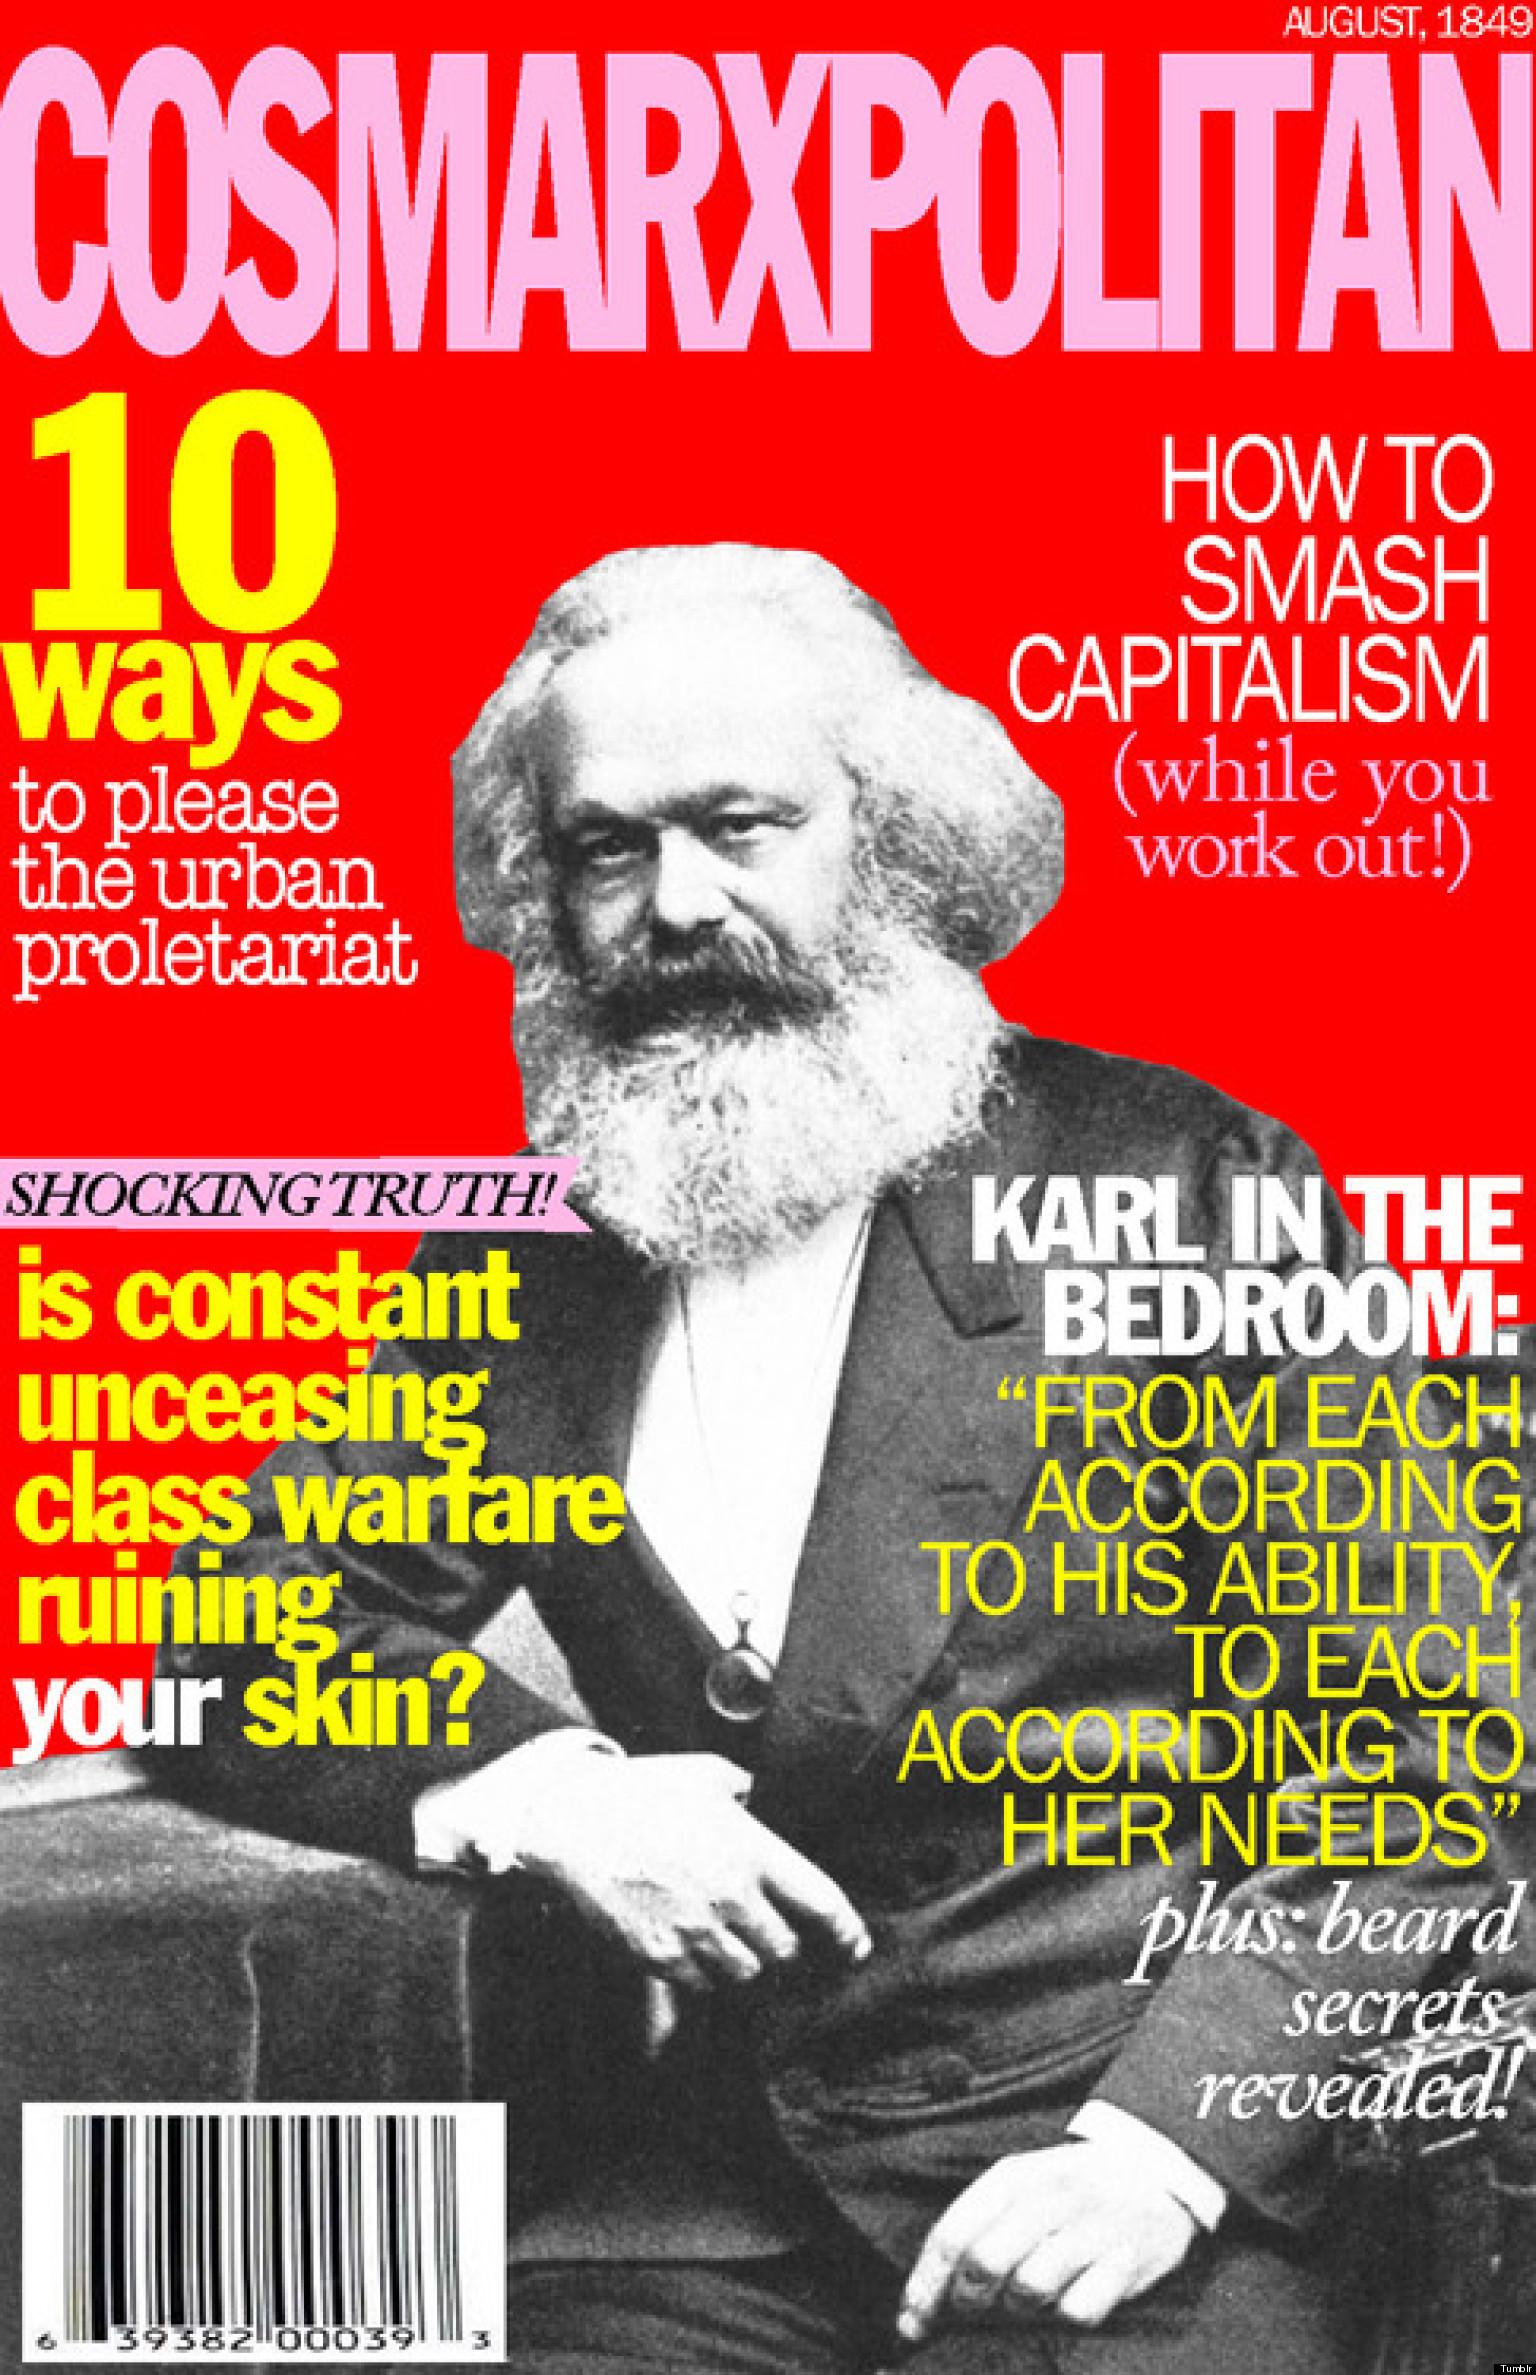 Cosmarxpolitan Tumblr Imagines Marxist Cosmopolitan Magazine Covers